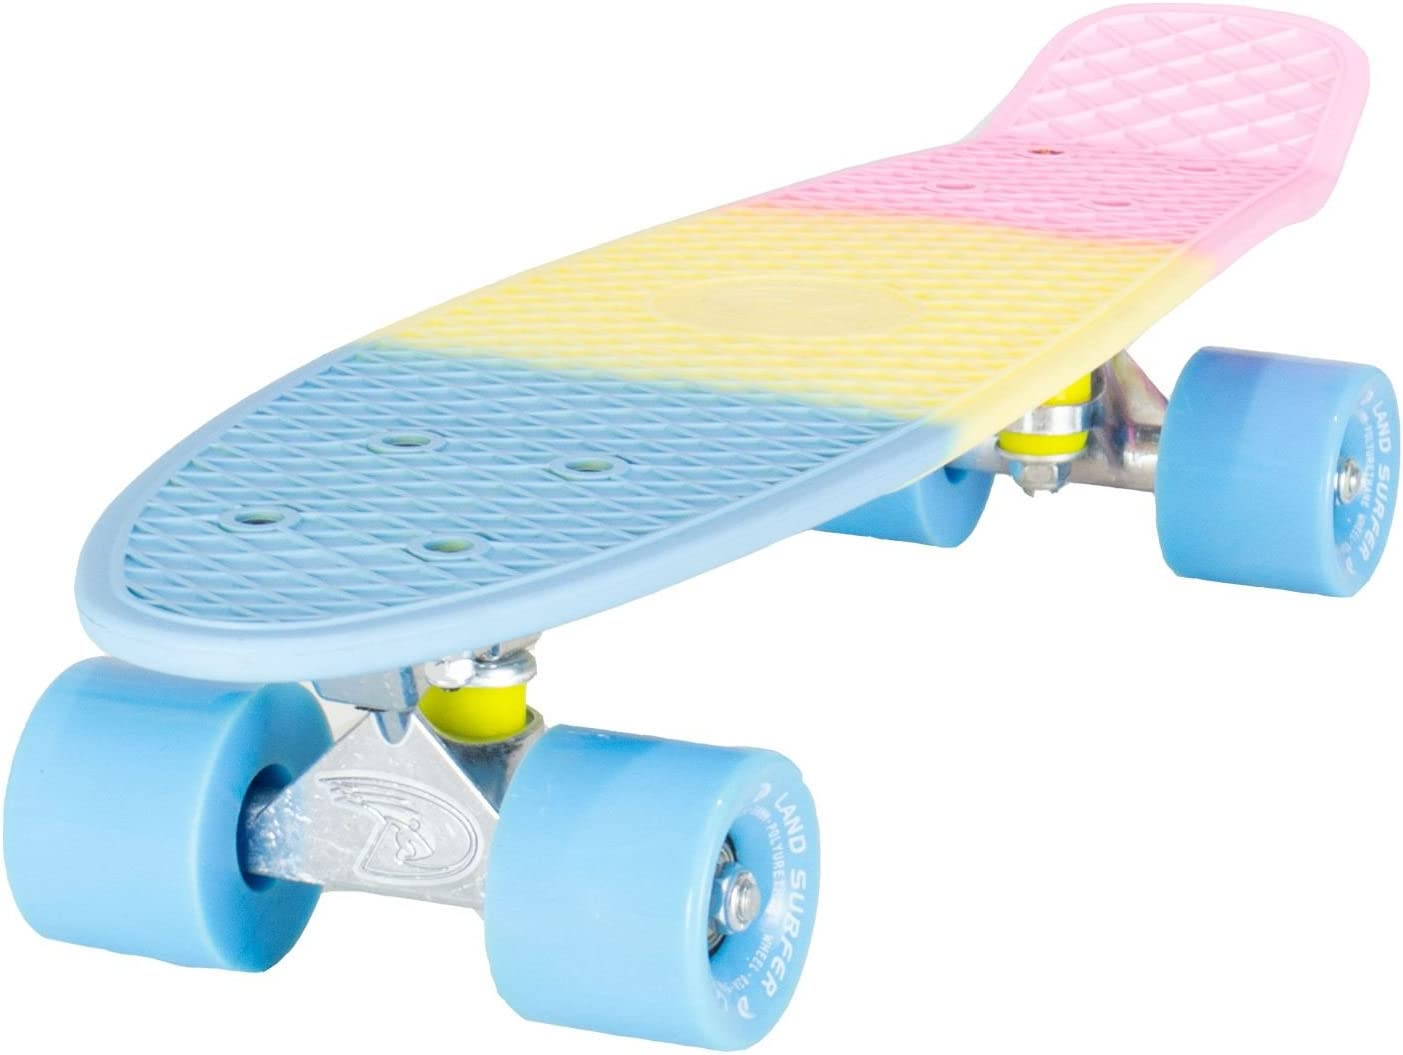 LAND SURFER/® Skateboard Cruiser Retro Completo 56cm con tabla de 3 tonos de colores diferentes cojinetes ABEC-7 Ruedas 59mm PU bolsa para el transporte